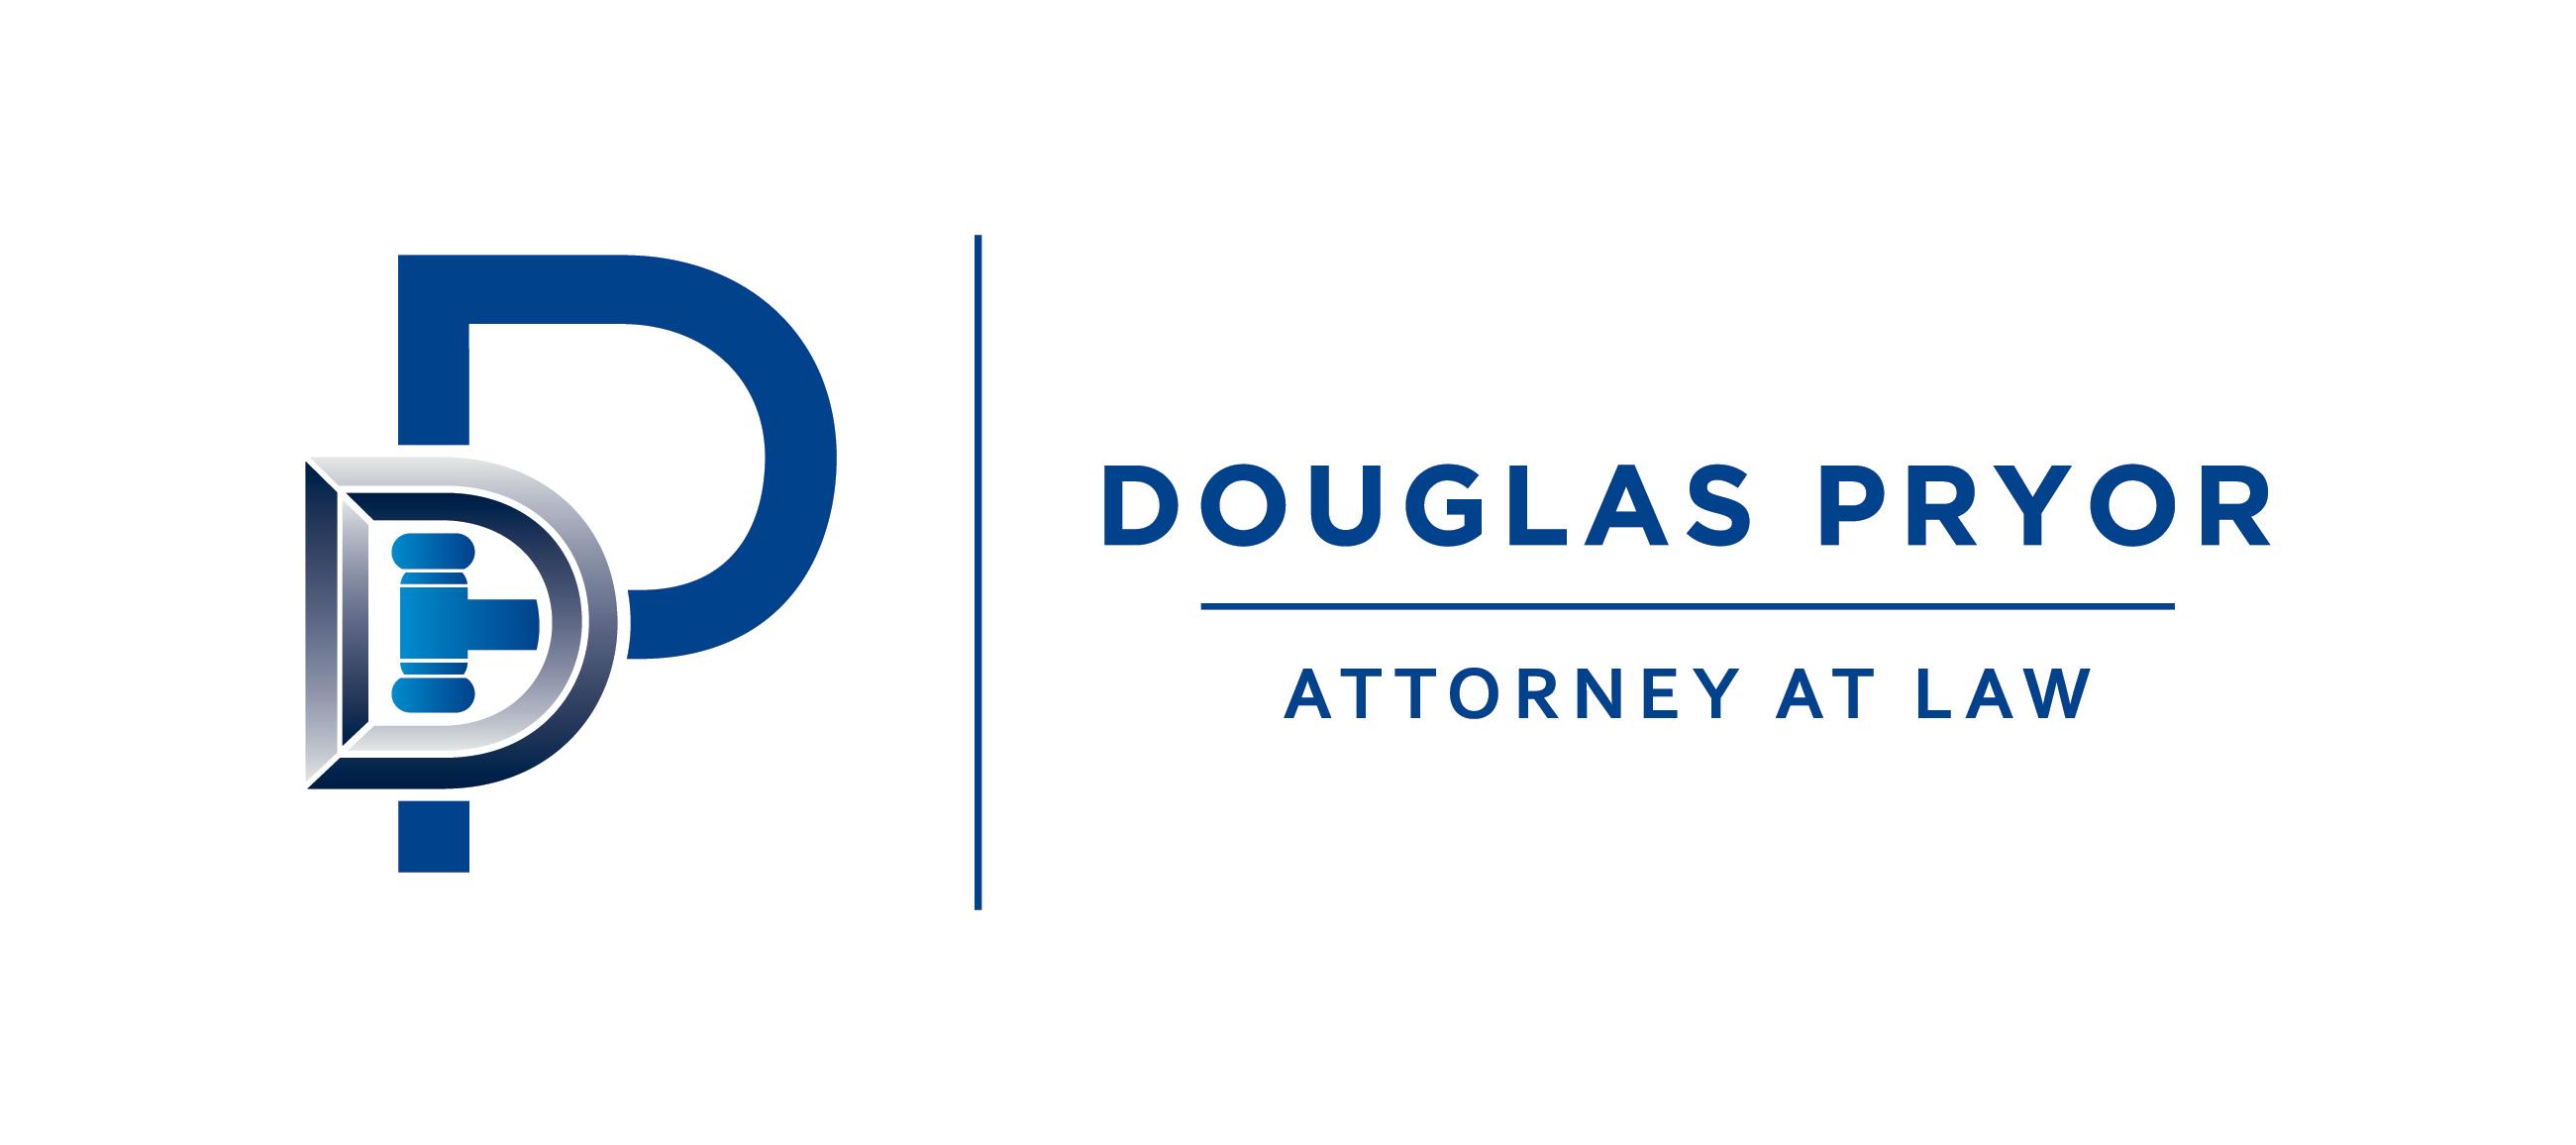 Law Office Of Douglas Pryor & Associates